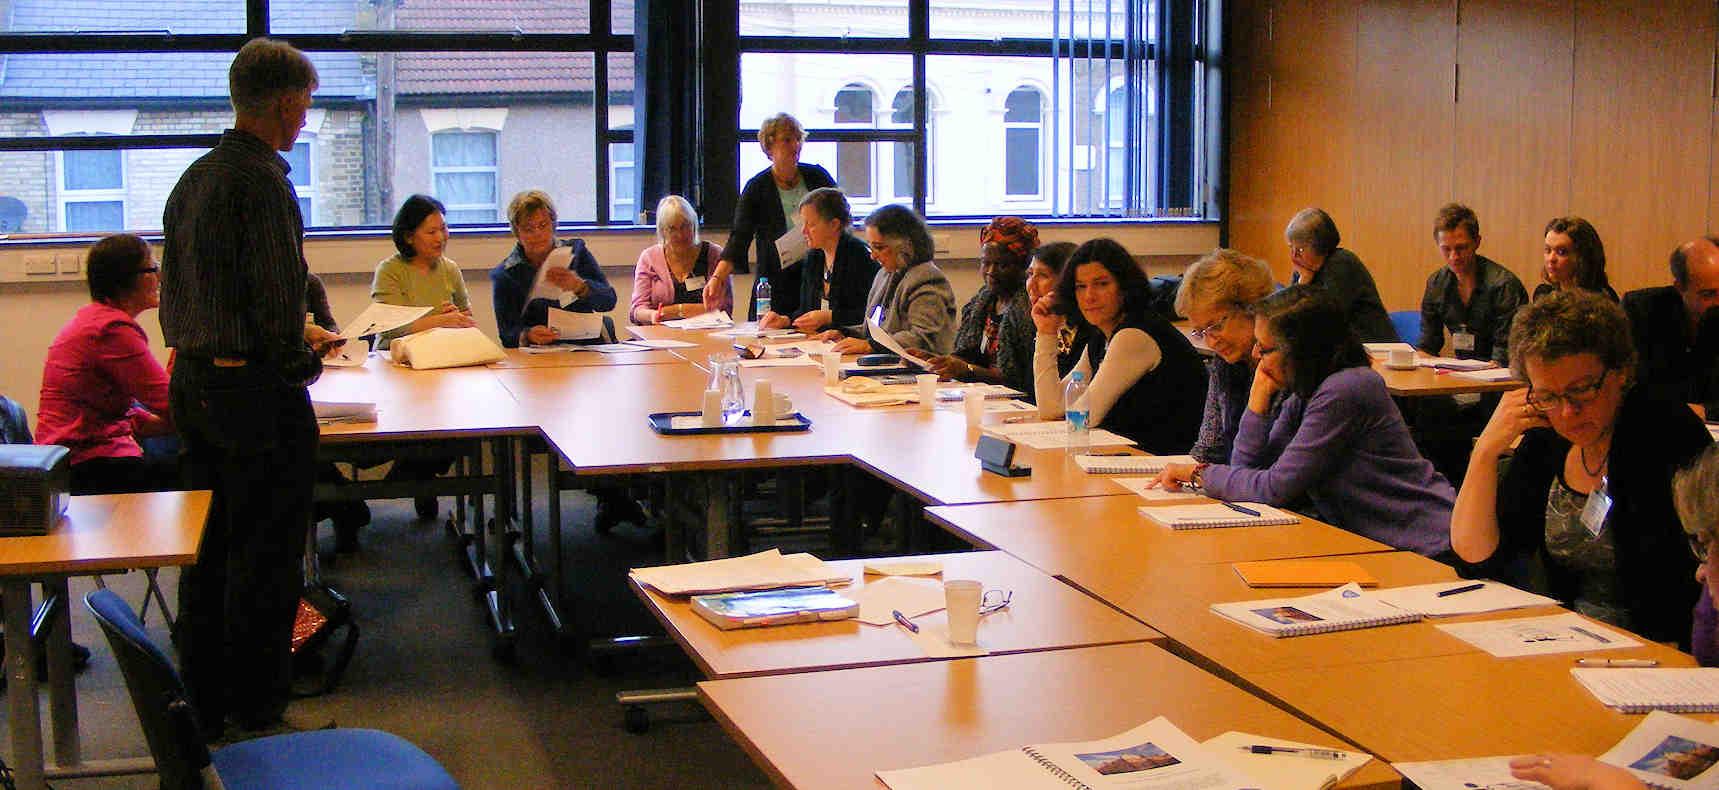 London meeting 2011